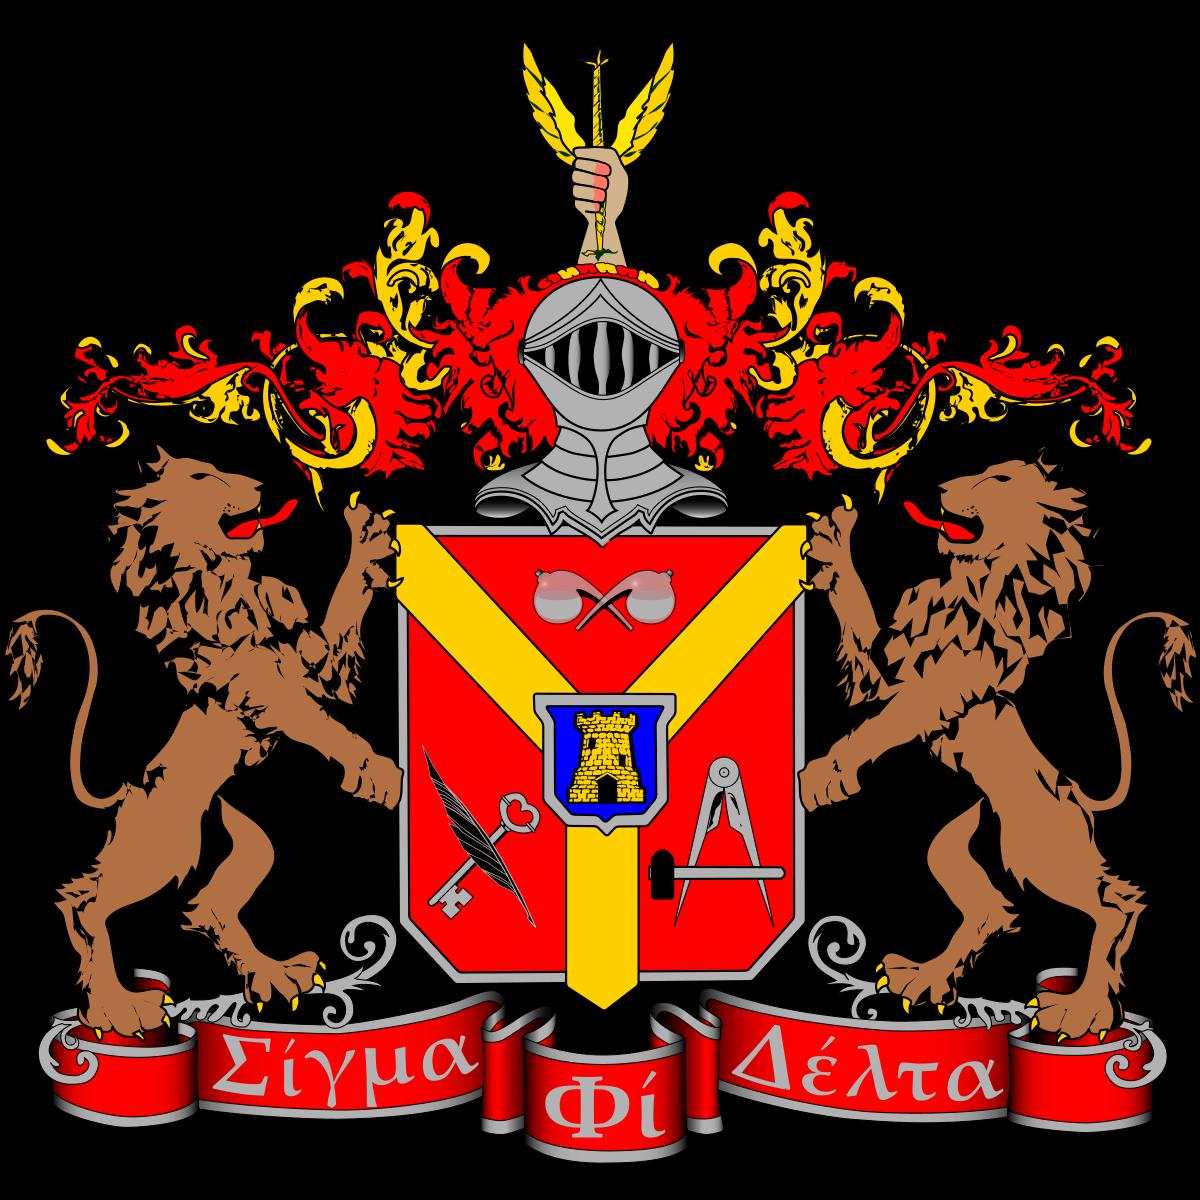 Beta sigma phi clipart 2015 png Sigma Phi Delta - Wikipedia png